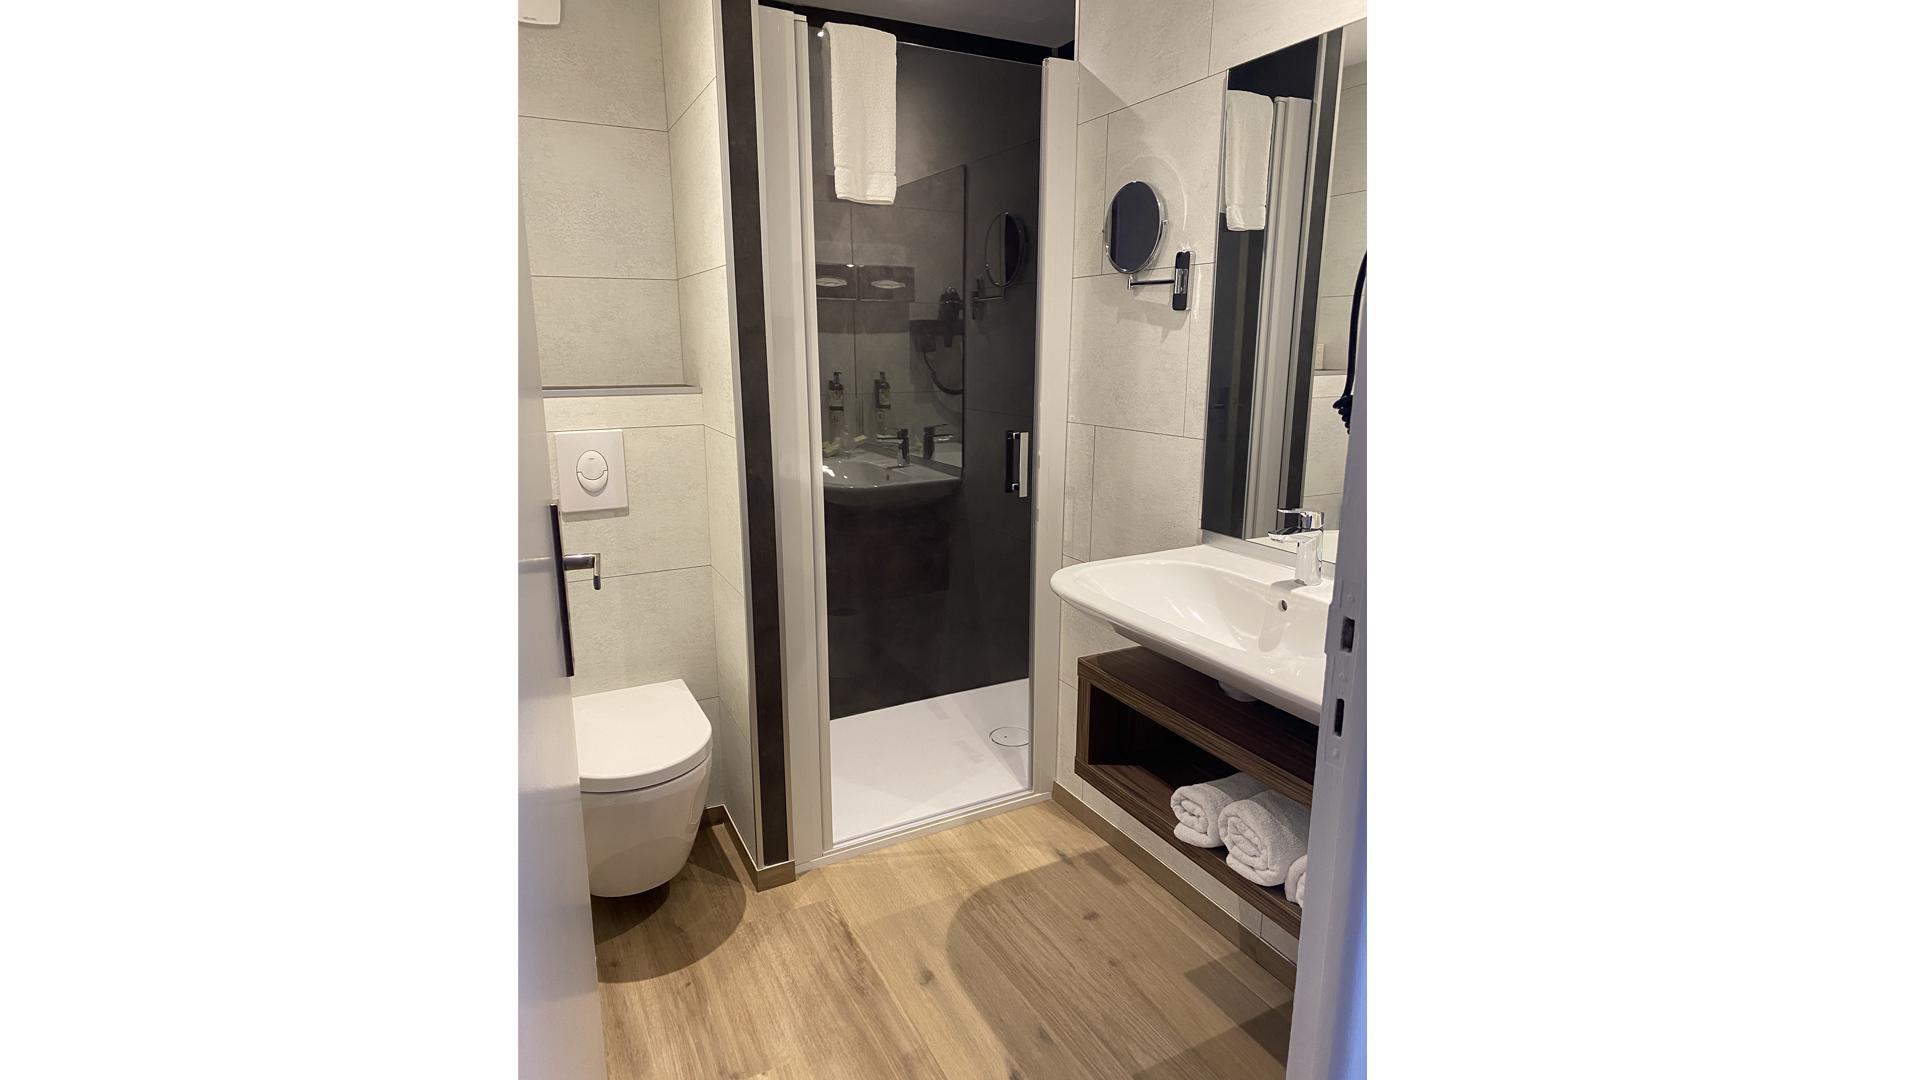 hotel-chambre-elegance-vue-jardin-quiberon-hotel-europa-diaporama2020-5